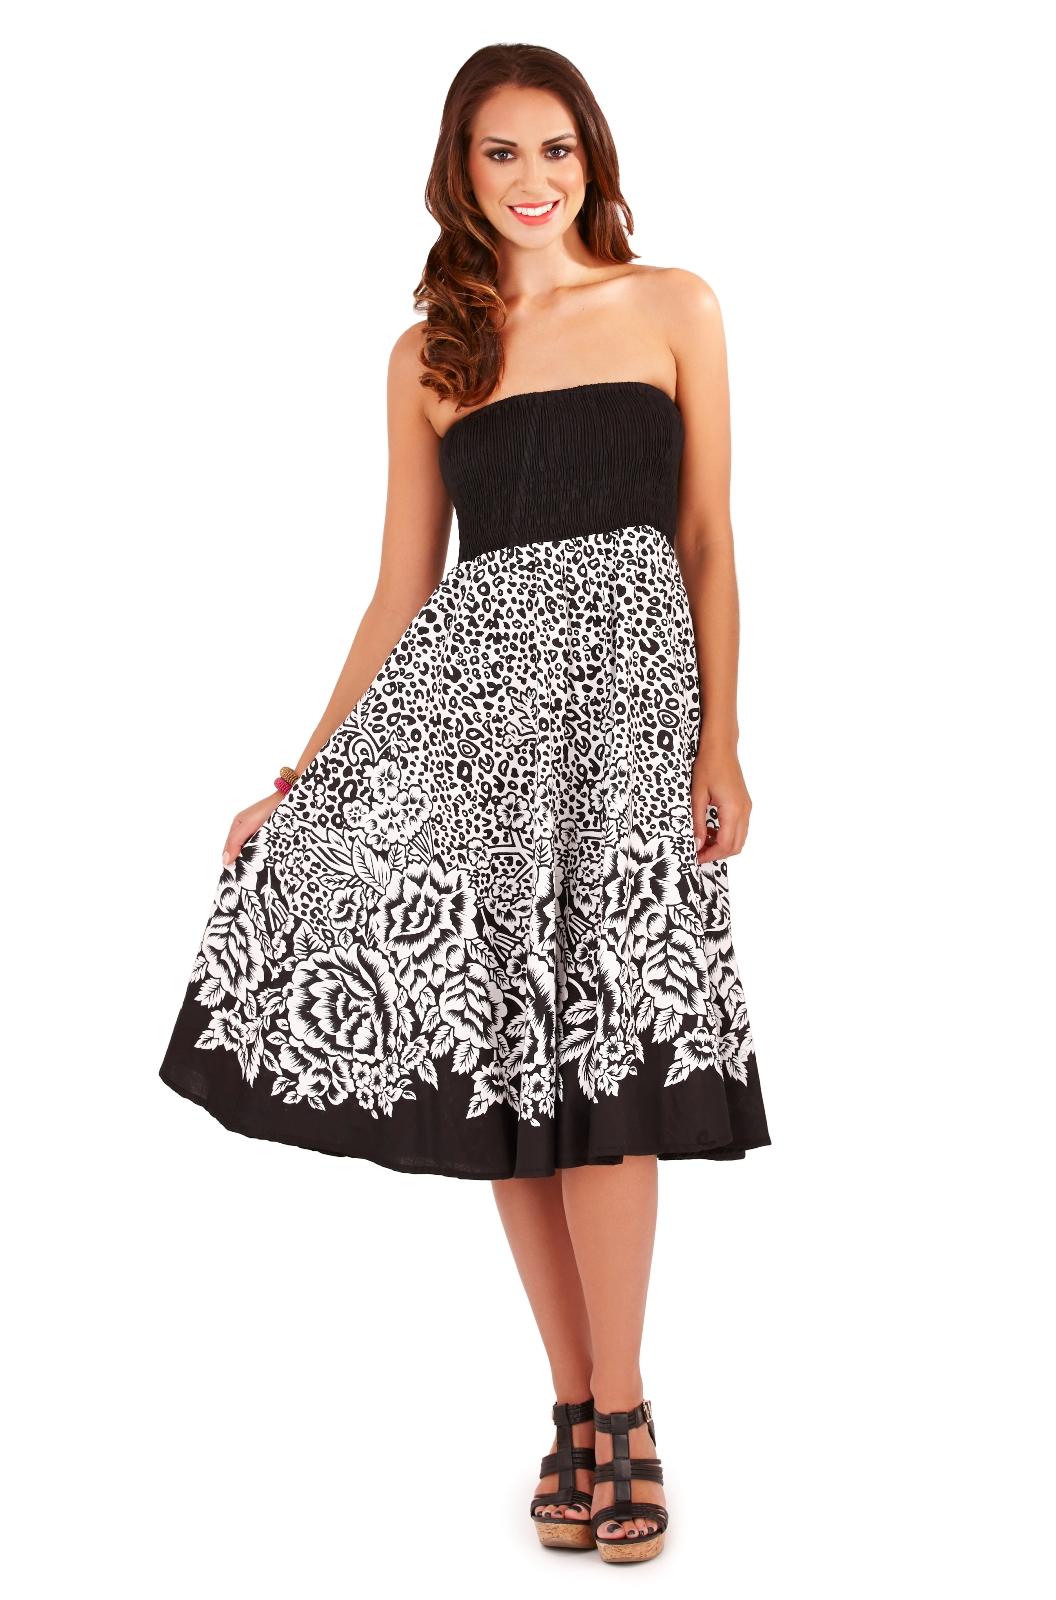 womens 2 in 1 strapless beach summer dress long maxi skirt ladies size uk 8 16 ebay. Black Bedroom Furniture Sets. Home Design Ideas